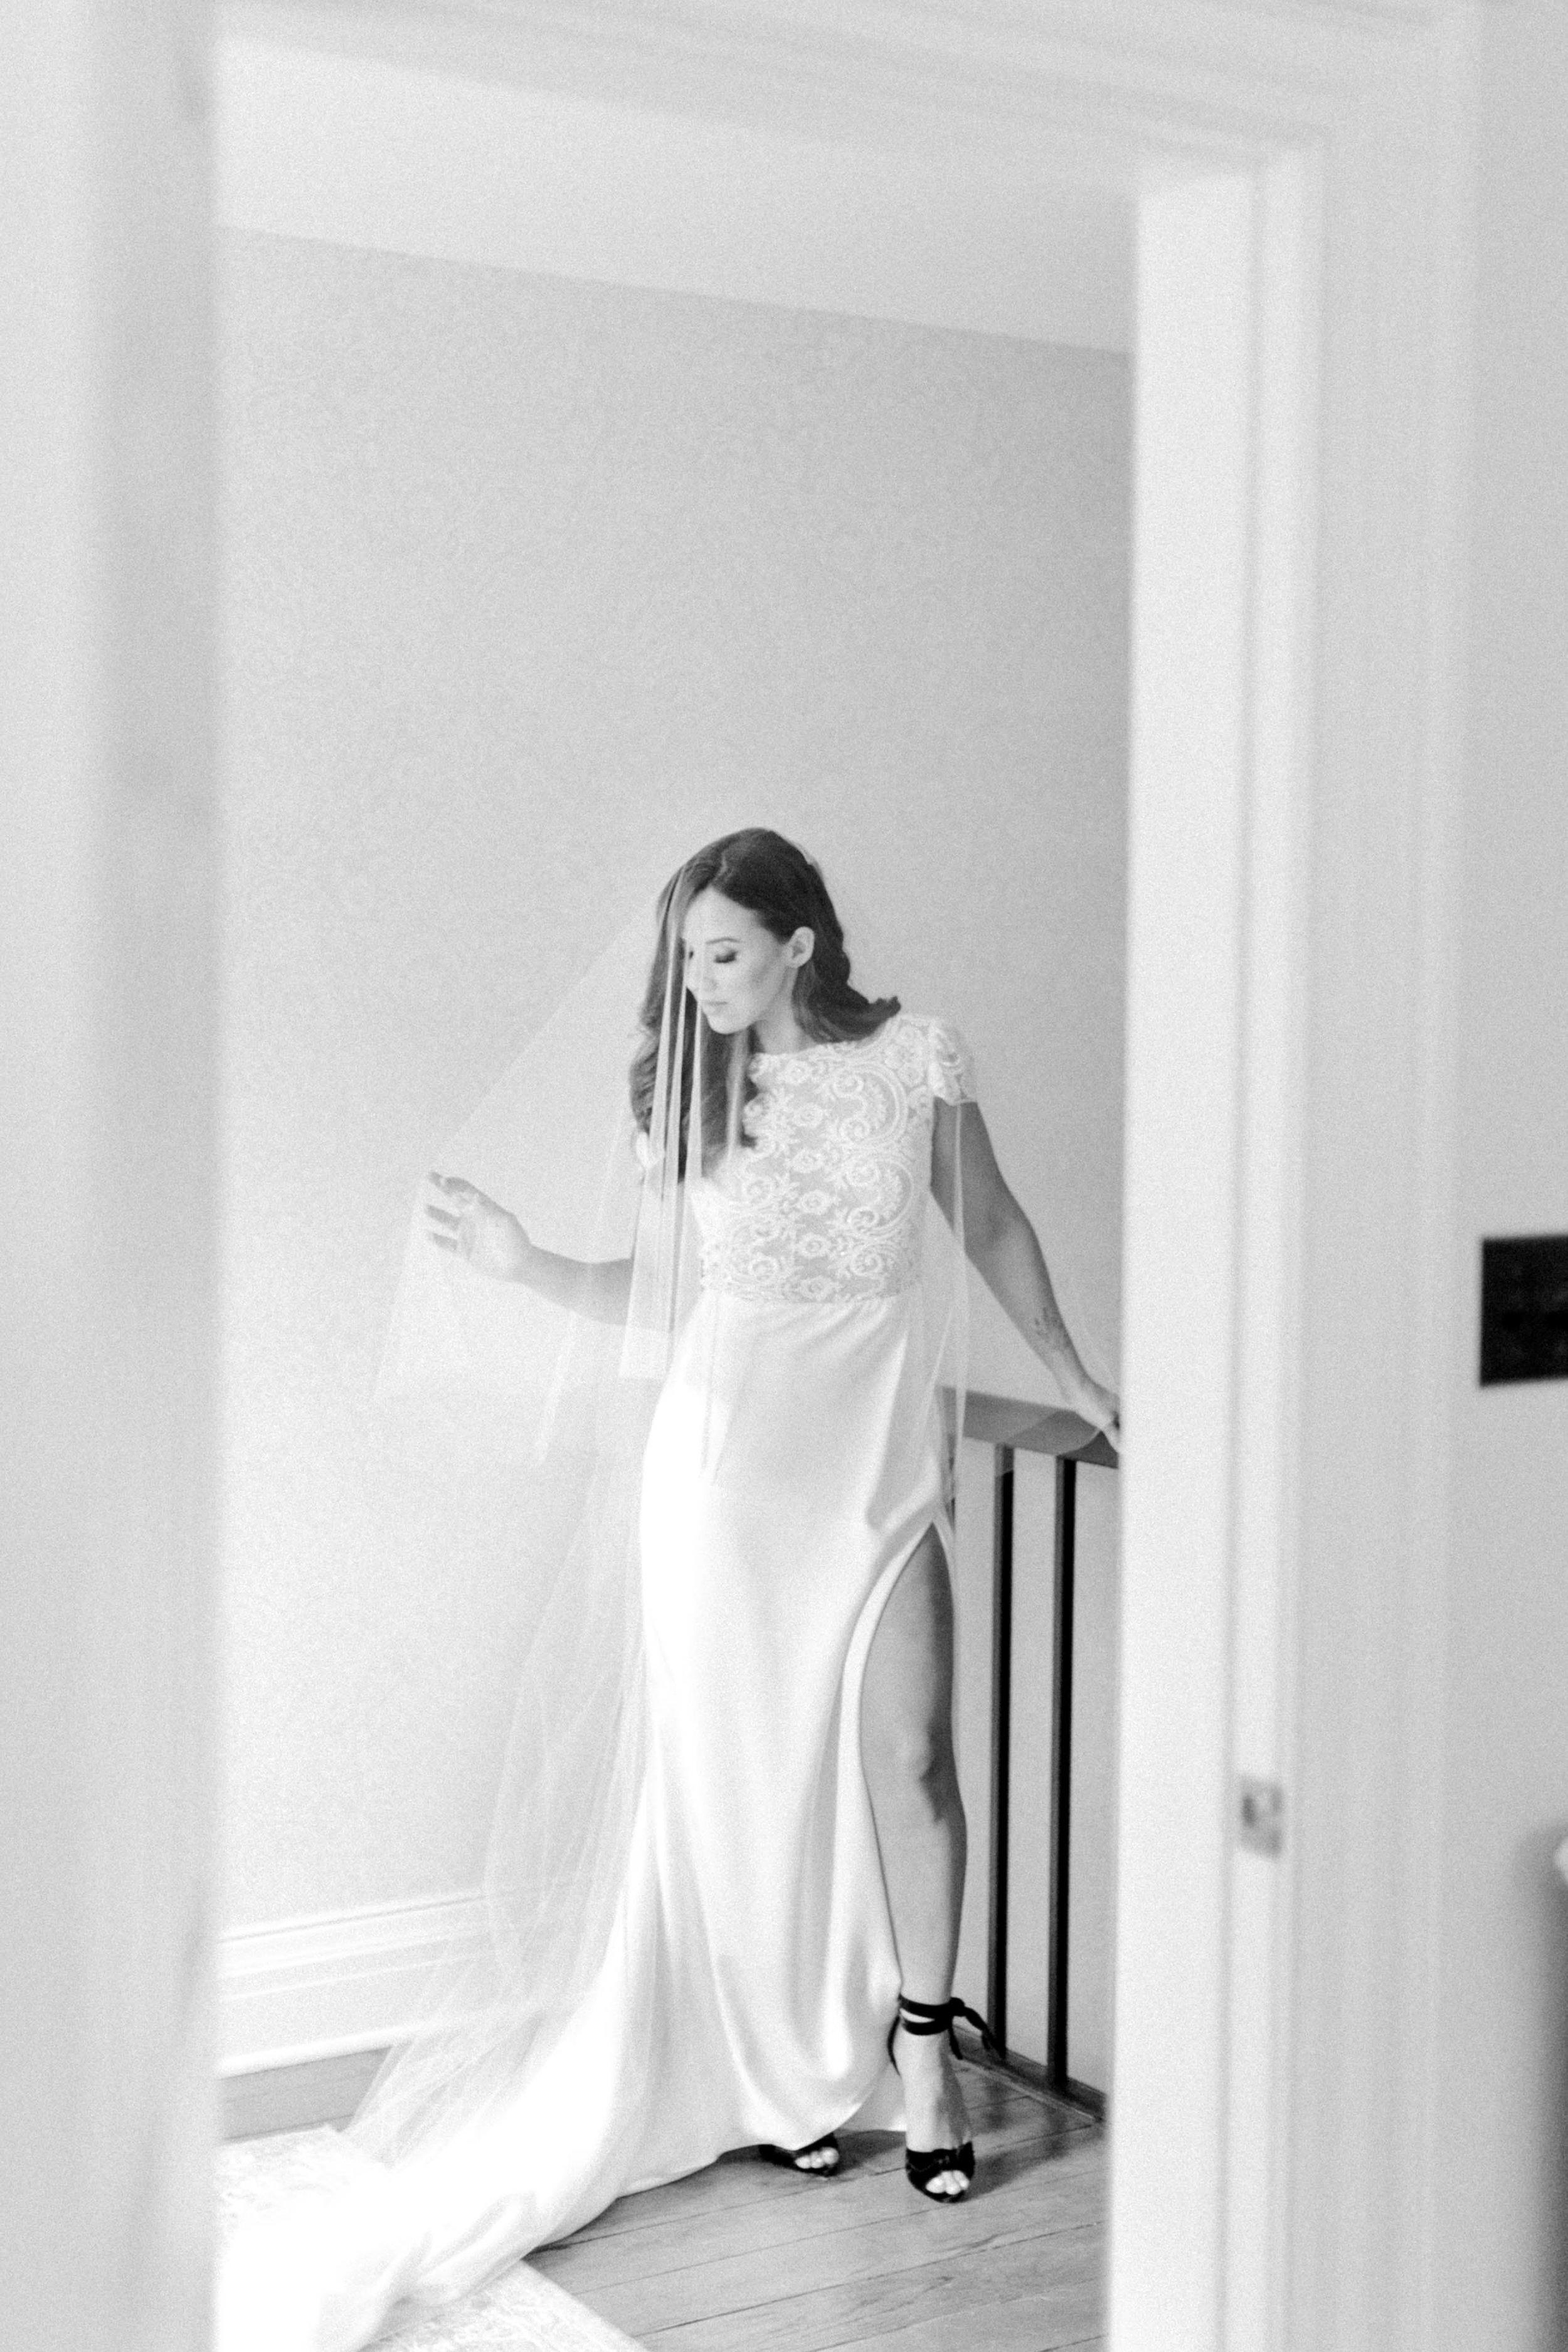 kurtz-gracewood-wedding-soft-airy-photographer-white-book-danielle-carmen-2.jpg